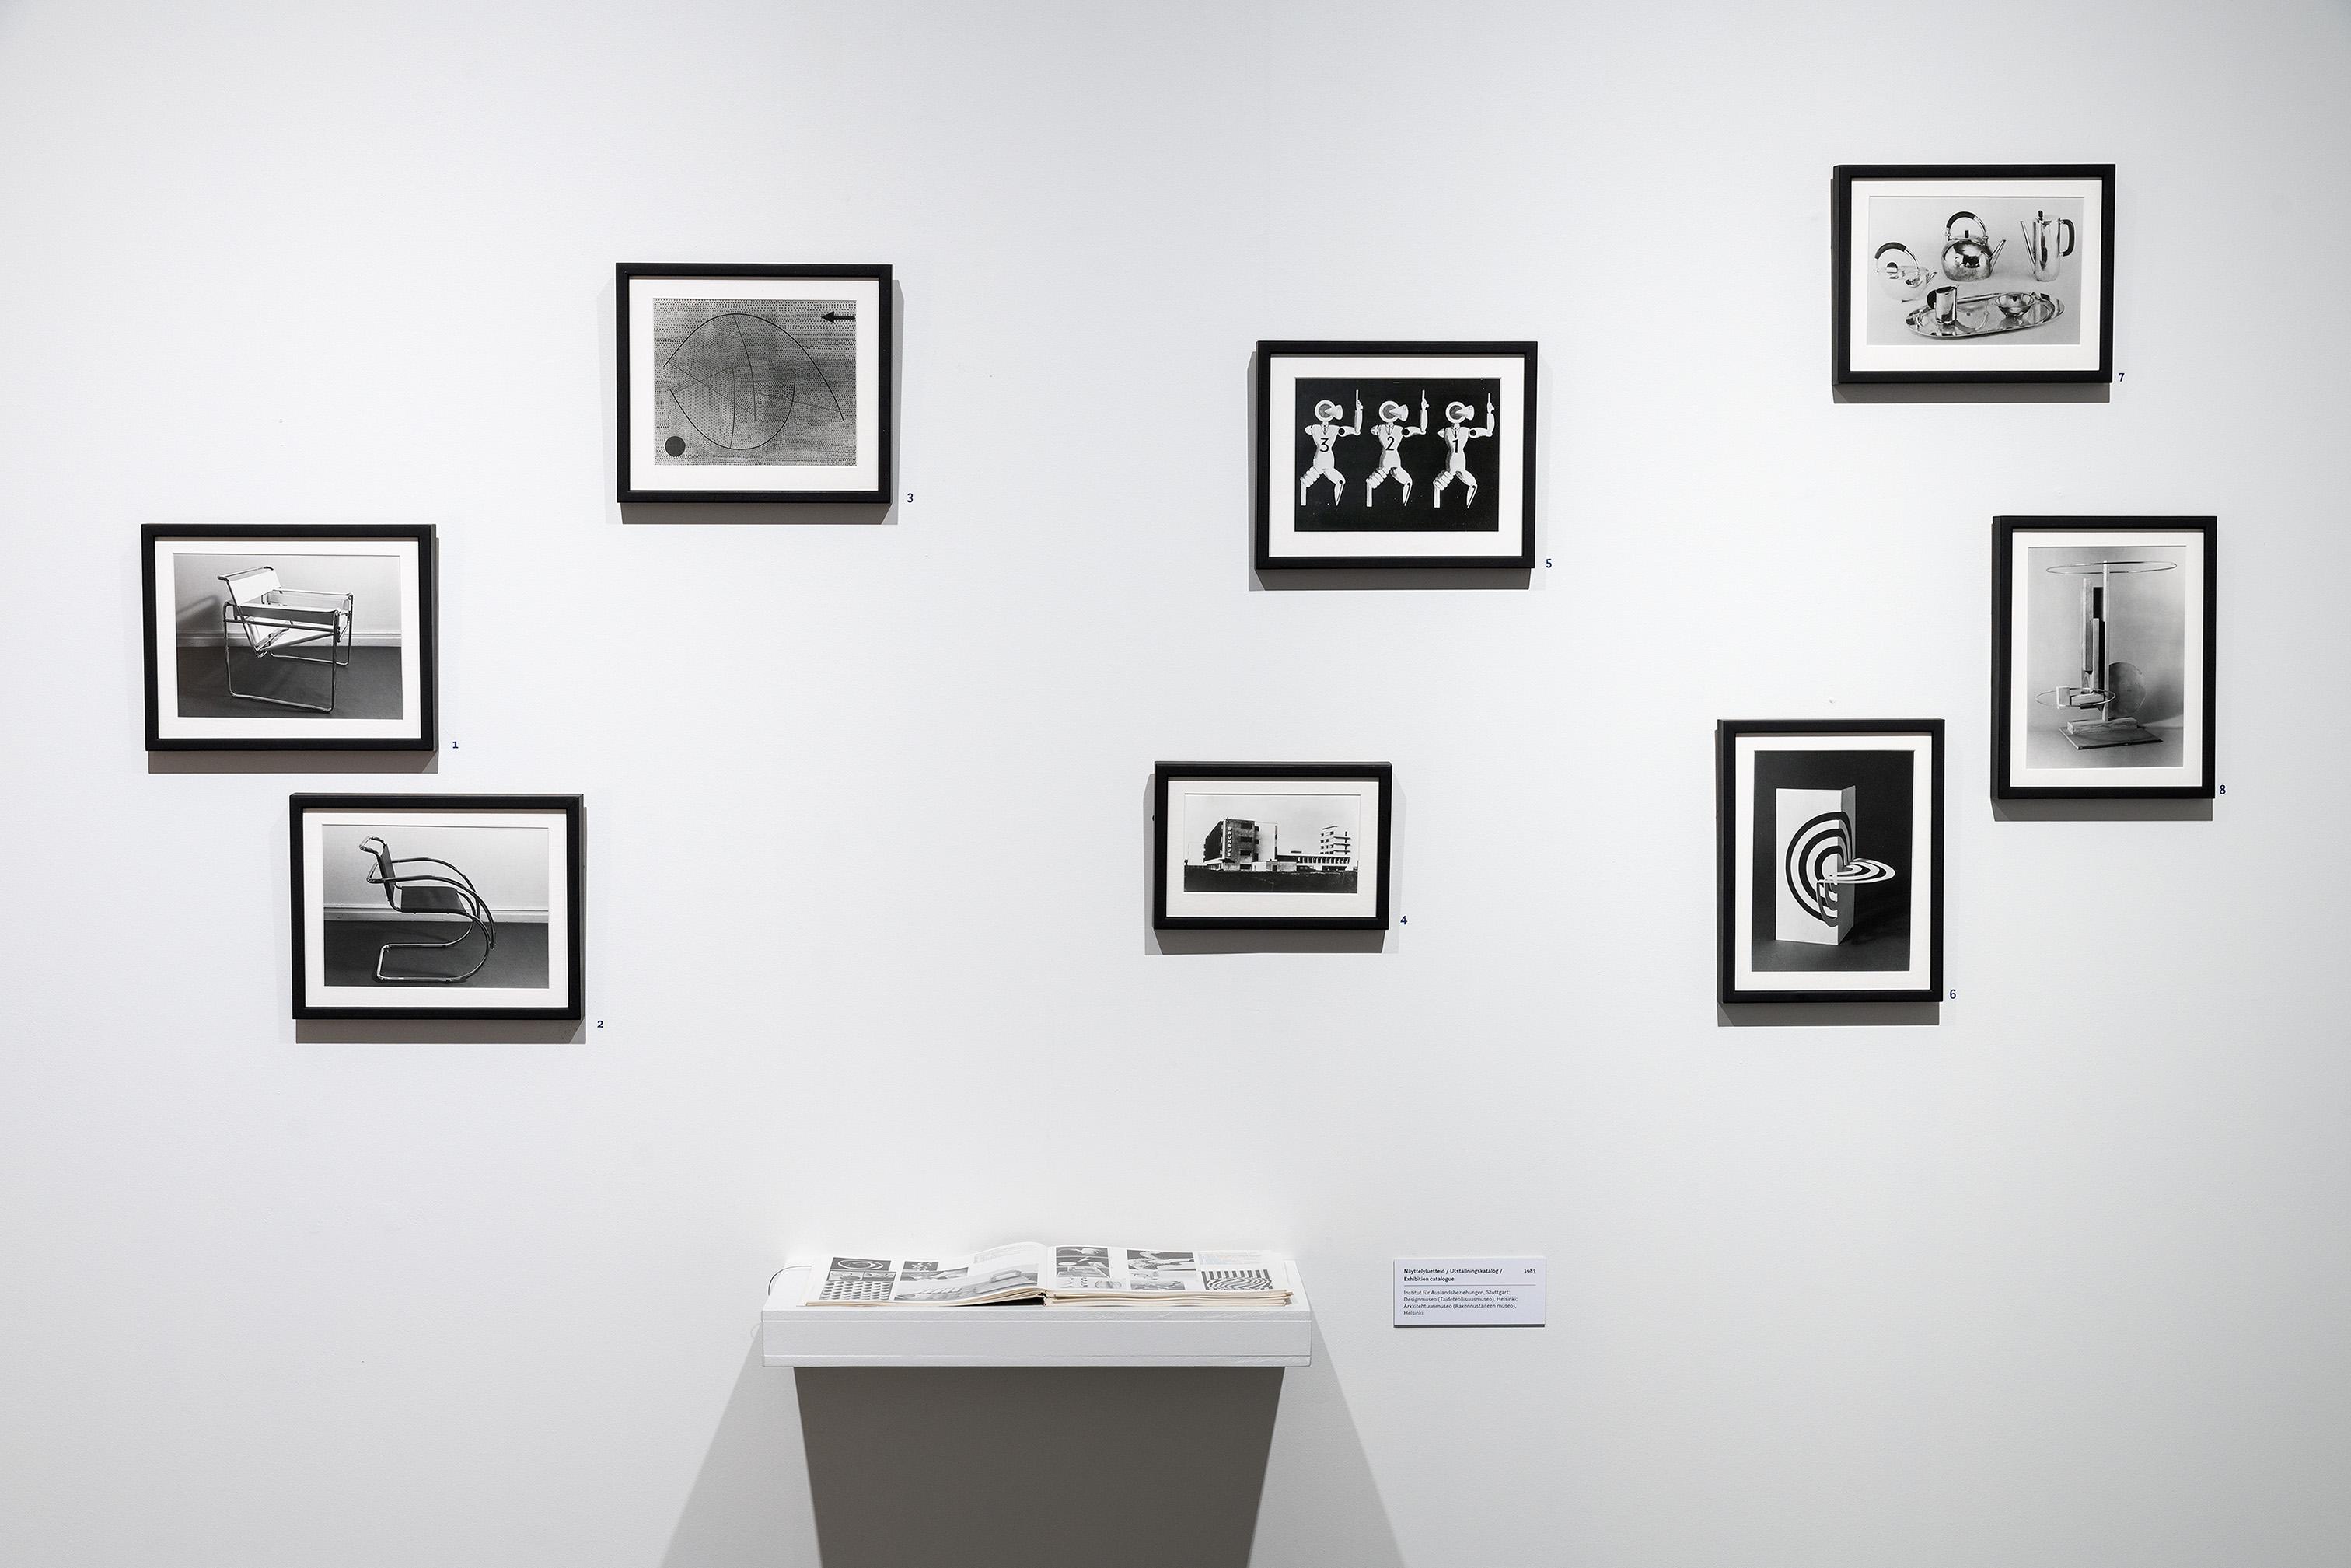 Fokus Bauhaus exhibition at Helsinki Des